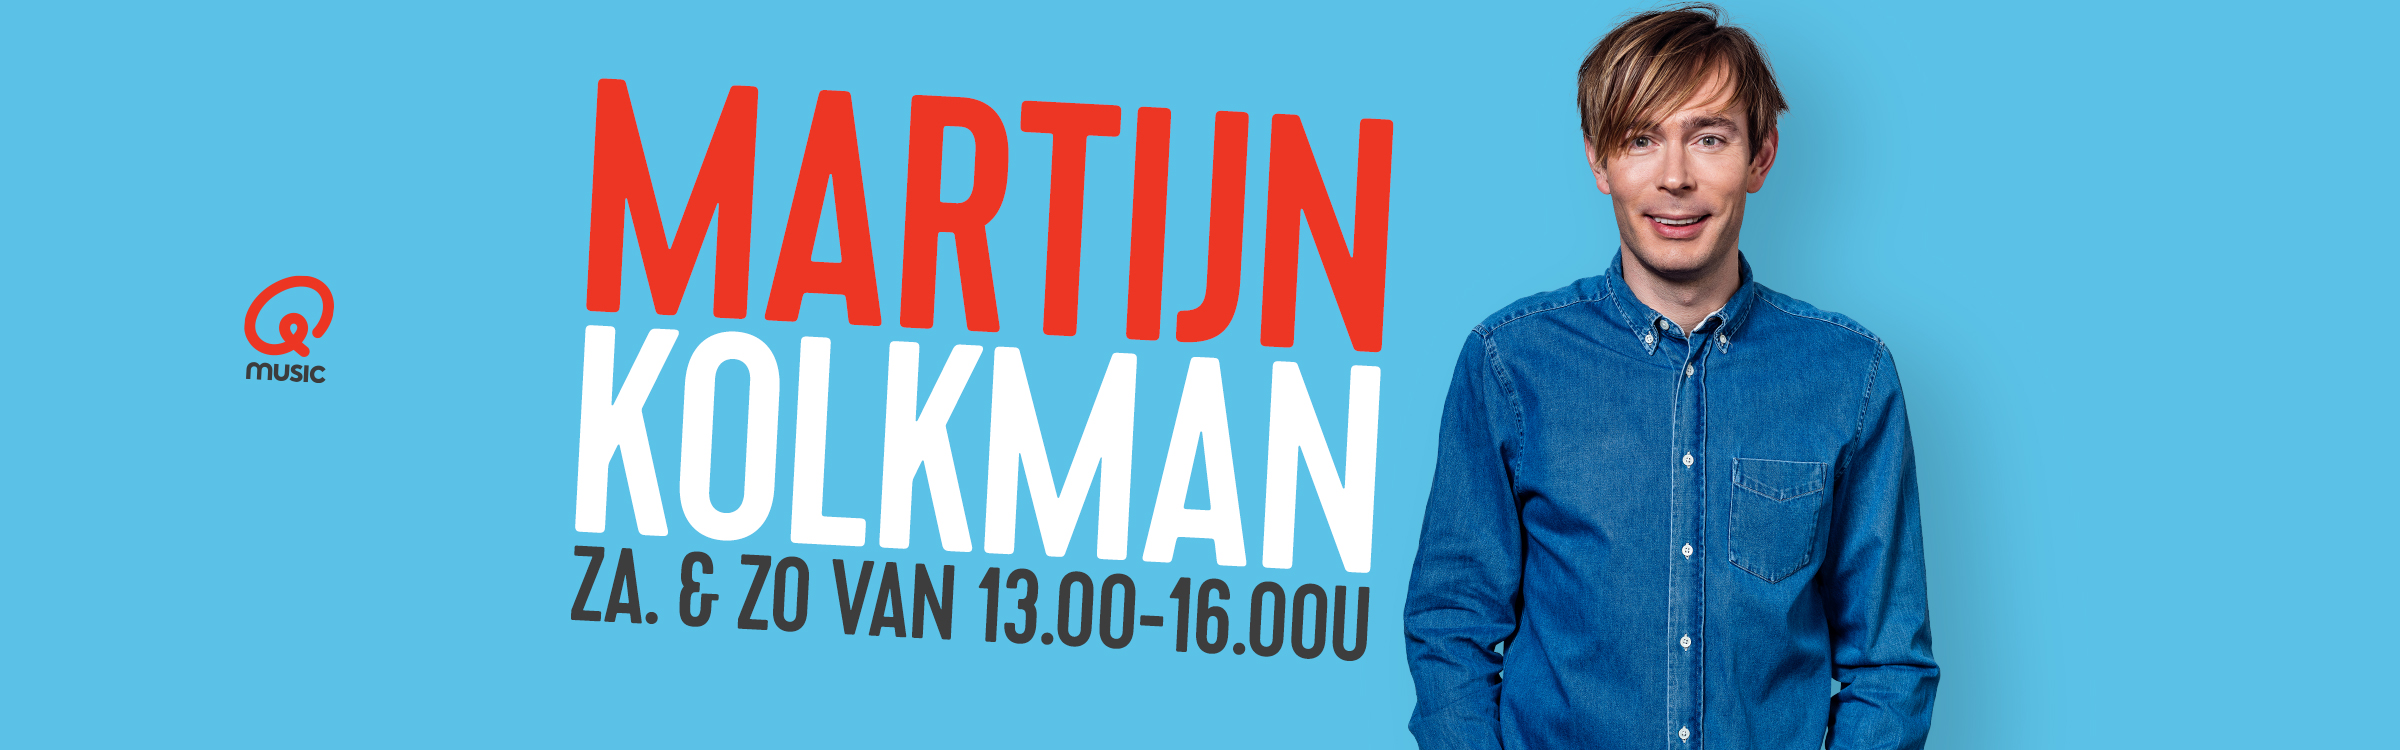 Martijn Kolkman